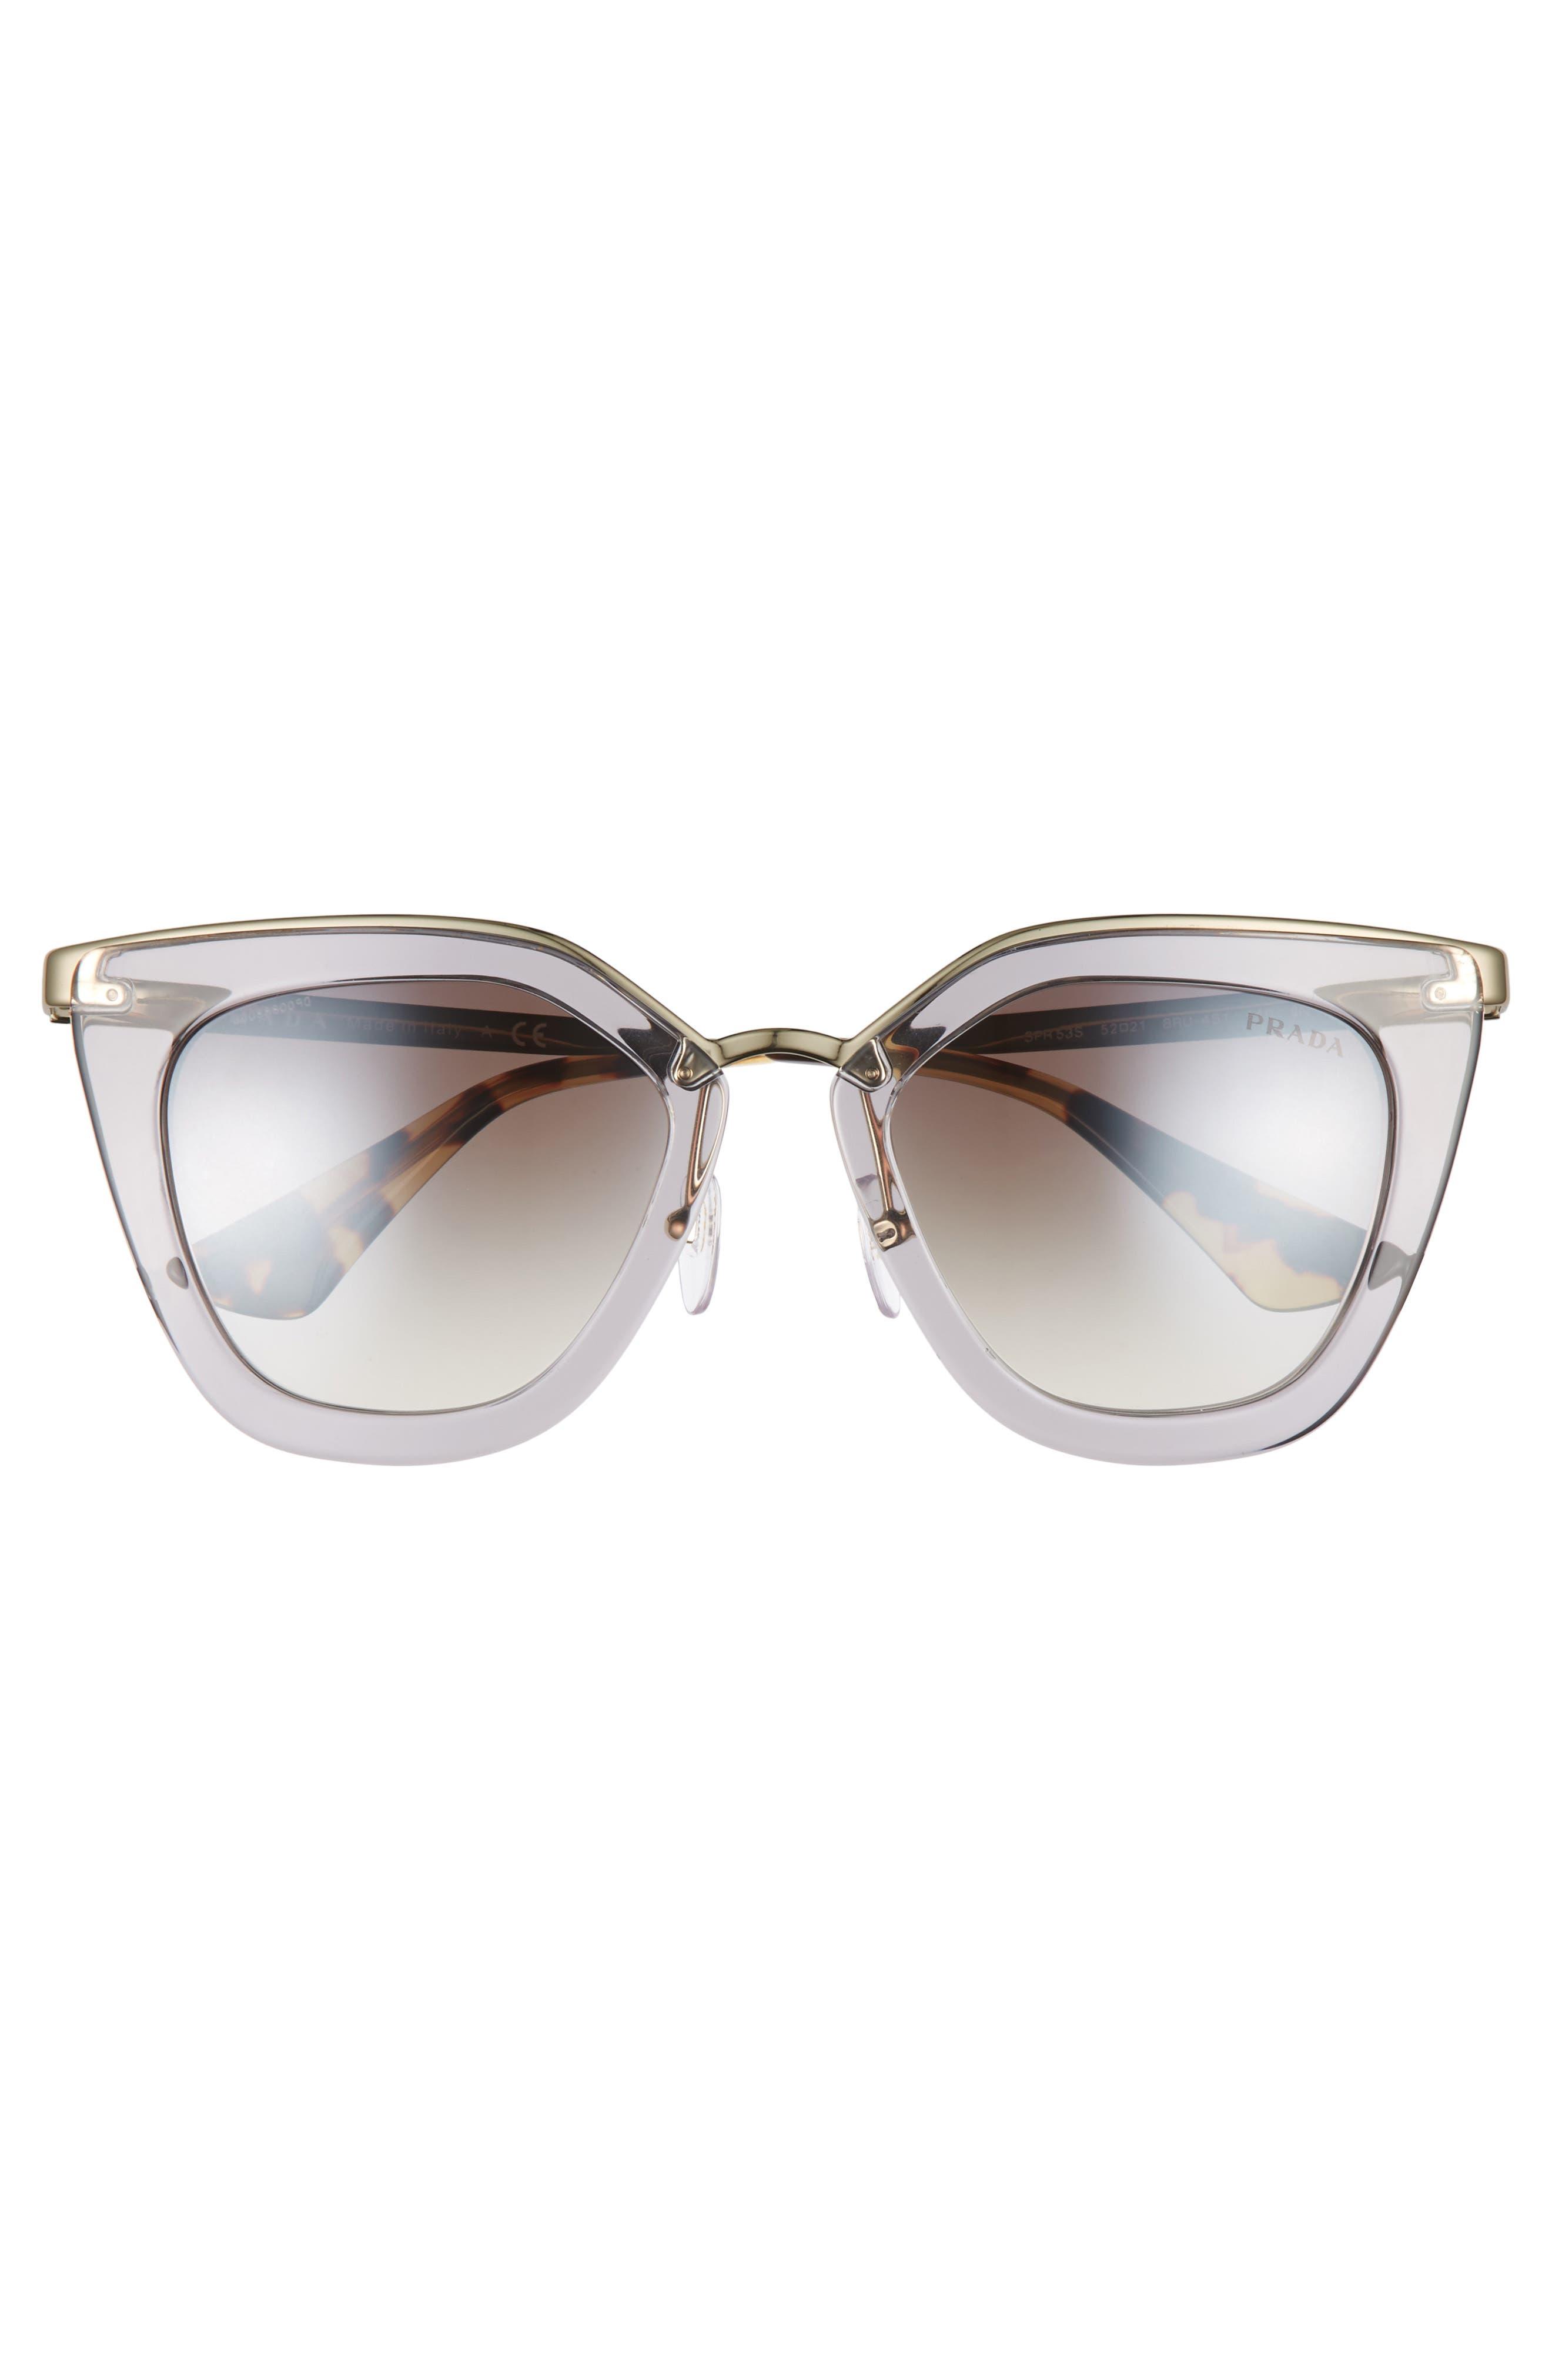 52mm Gradient Cat Eye Sunglasses,                             Alternate thumbnail 3, color,                             020